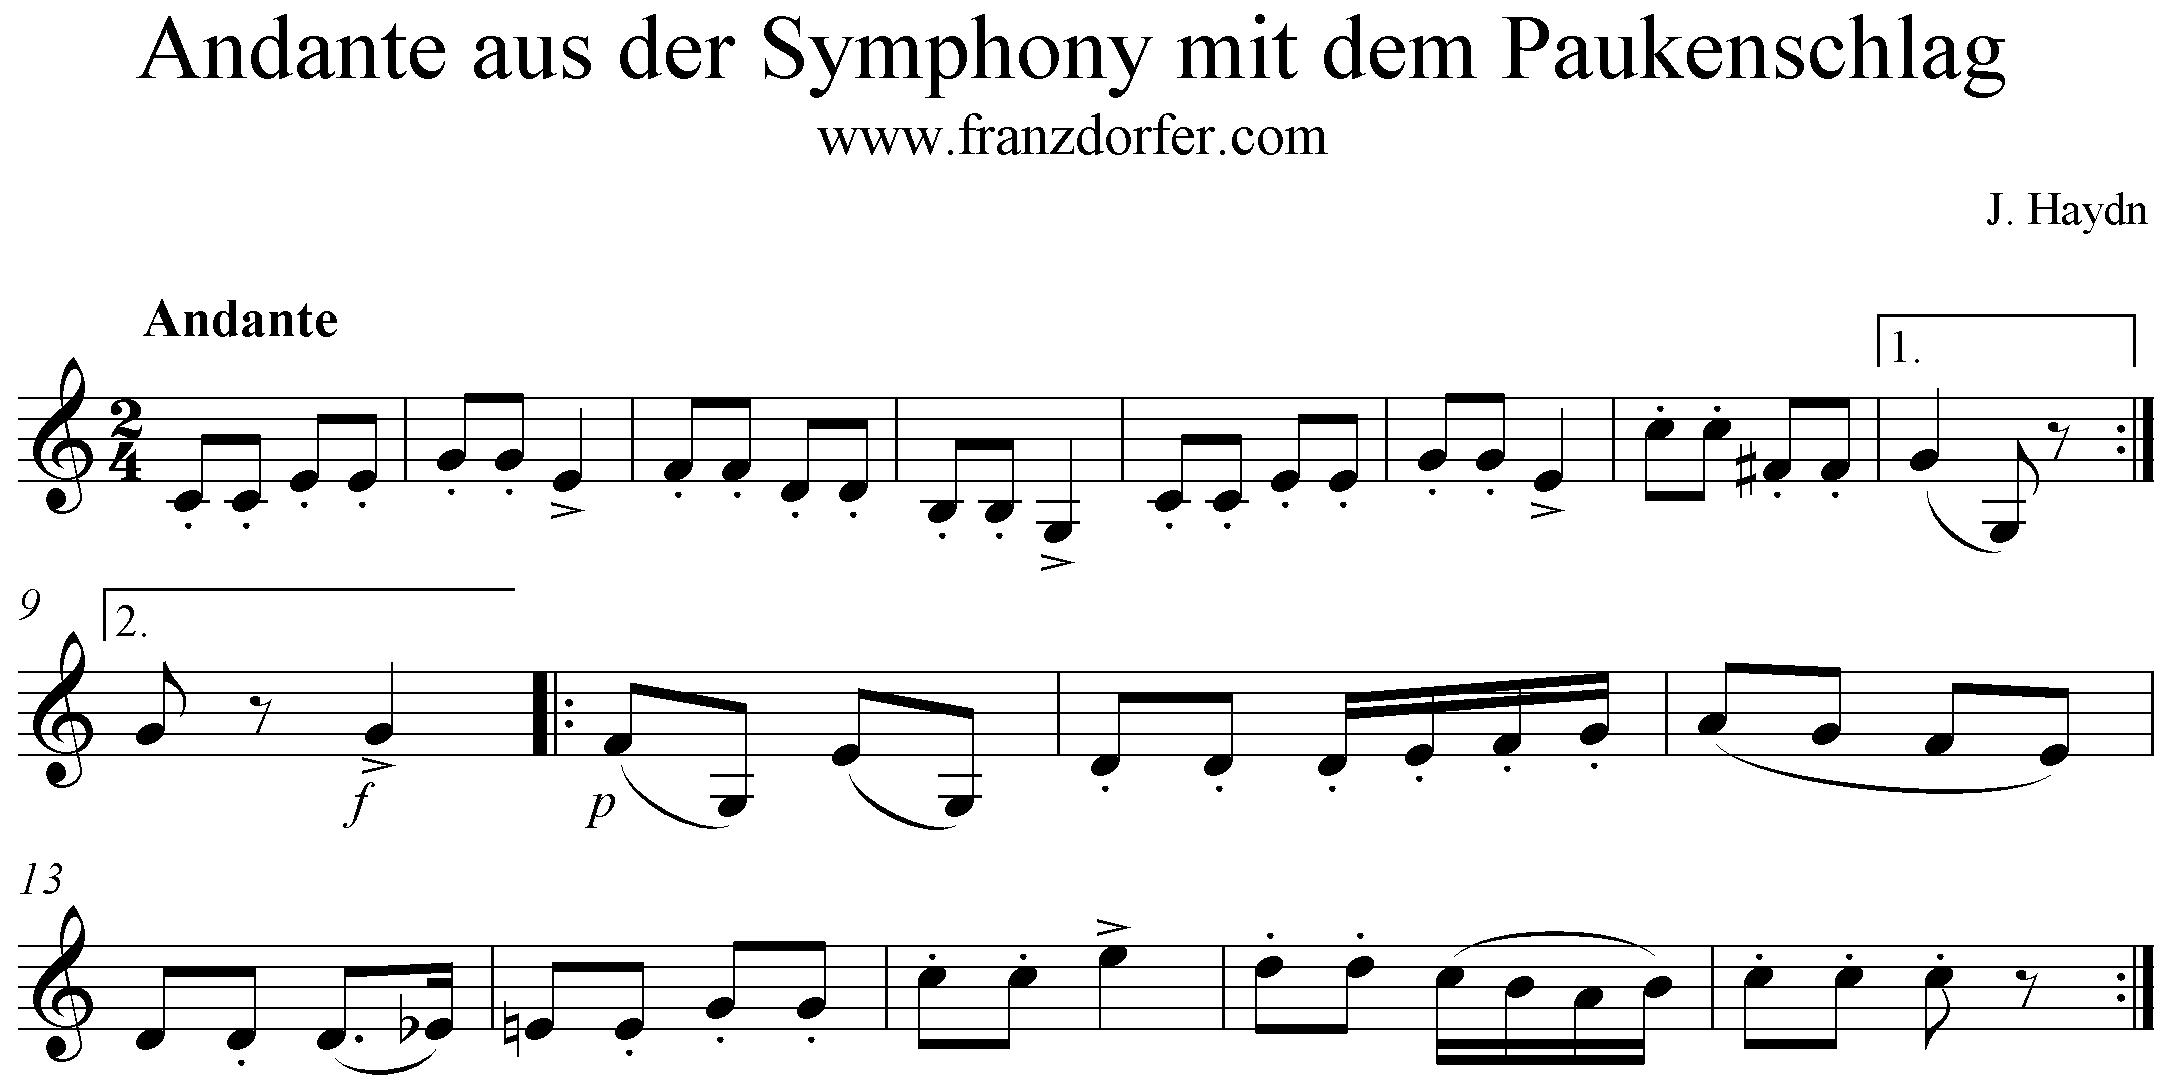 Symphonie Mit Dem Paukenschlag